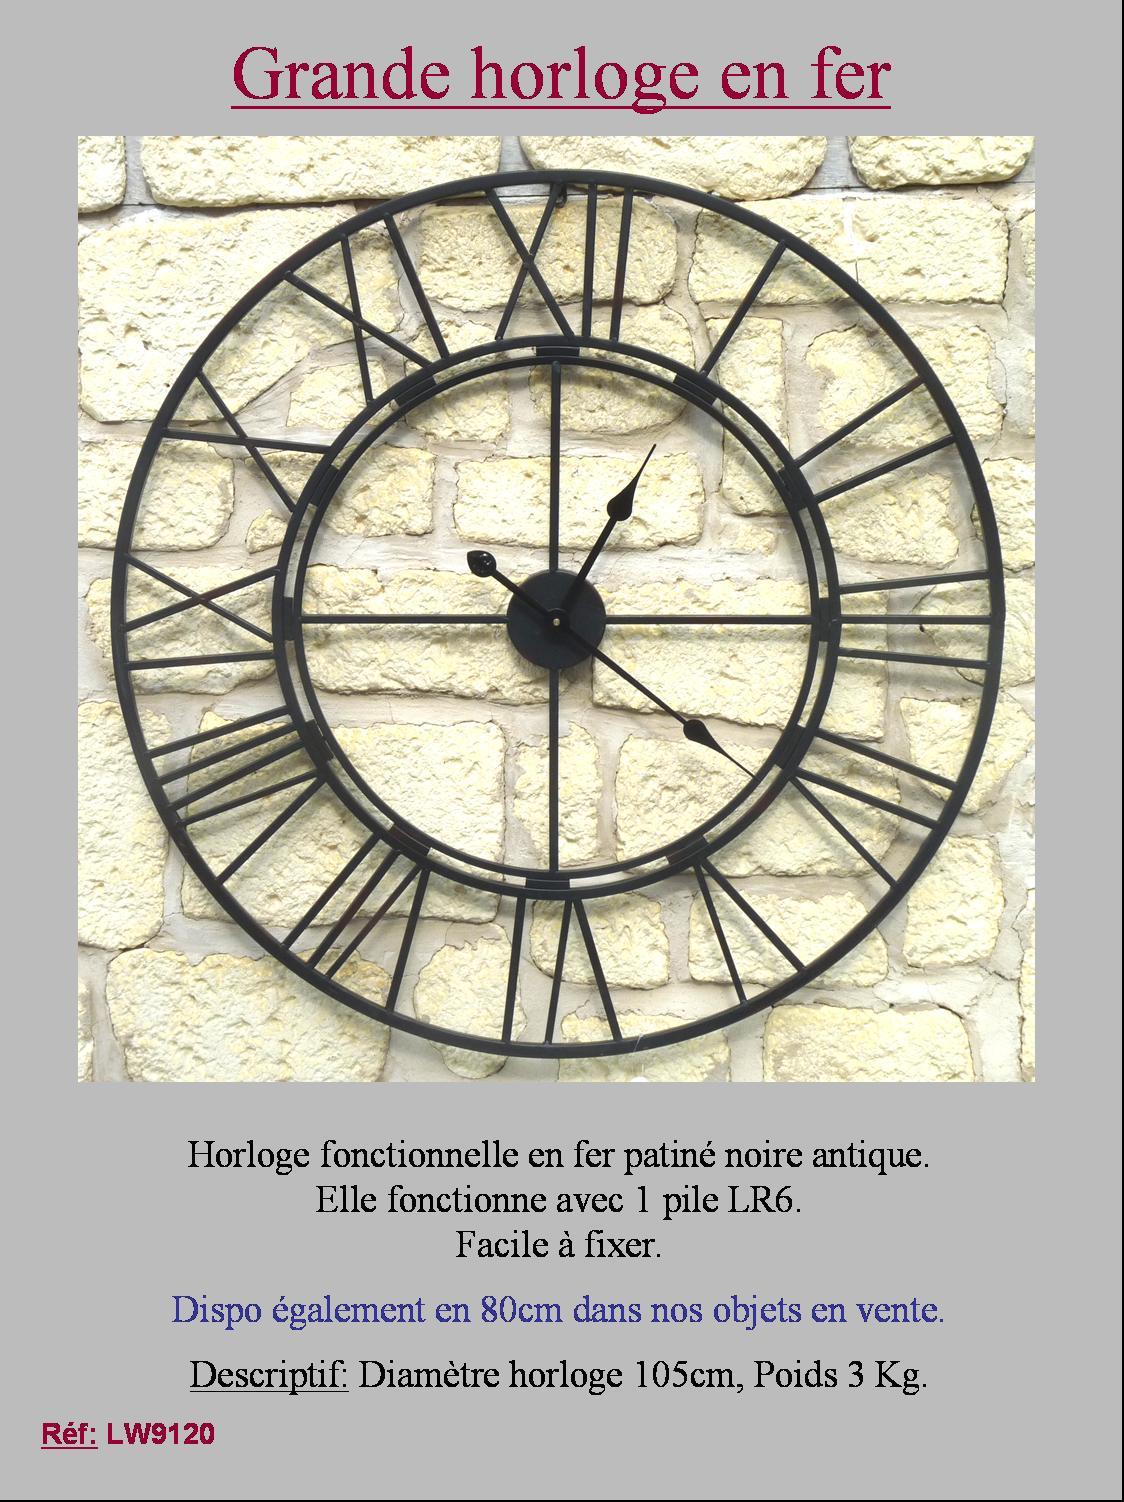 Style ancienne horloge ronde en fer metal murale industriel usine gare 105cm ebay for Horloge en fer